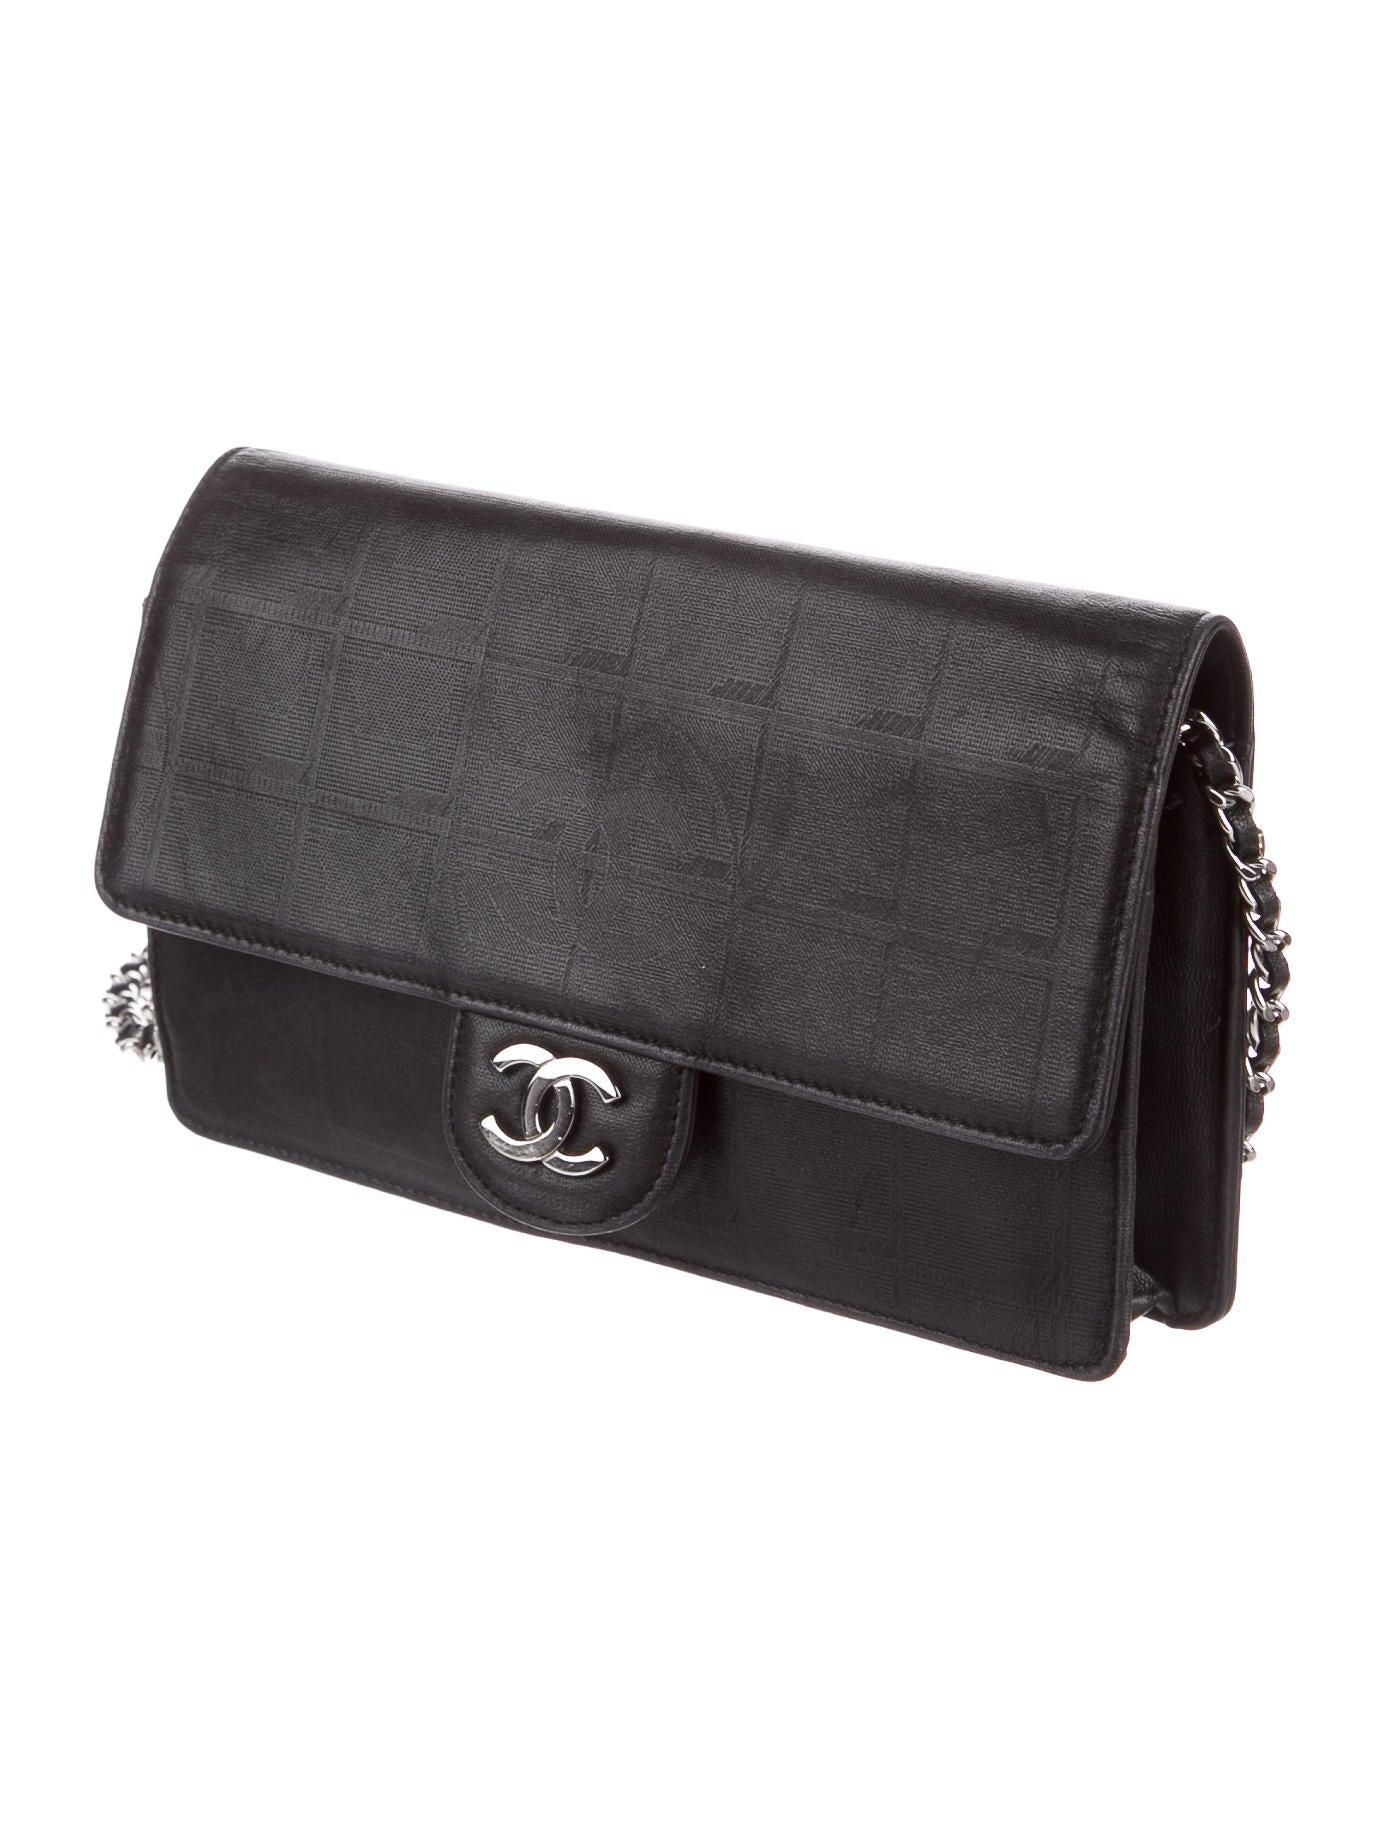 fd456f42cba2 Chanel Travel Ligne Wallet On Chain - Handbags - CHA210598 .